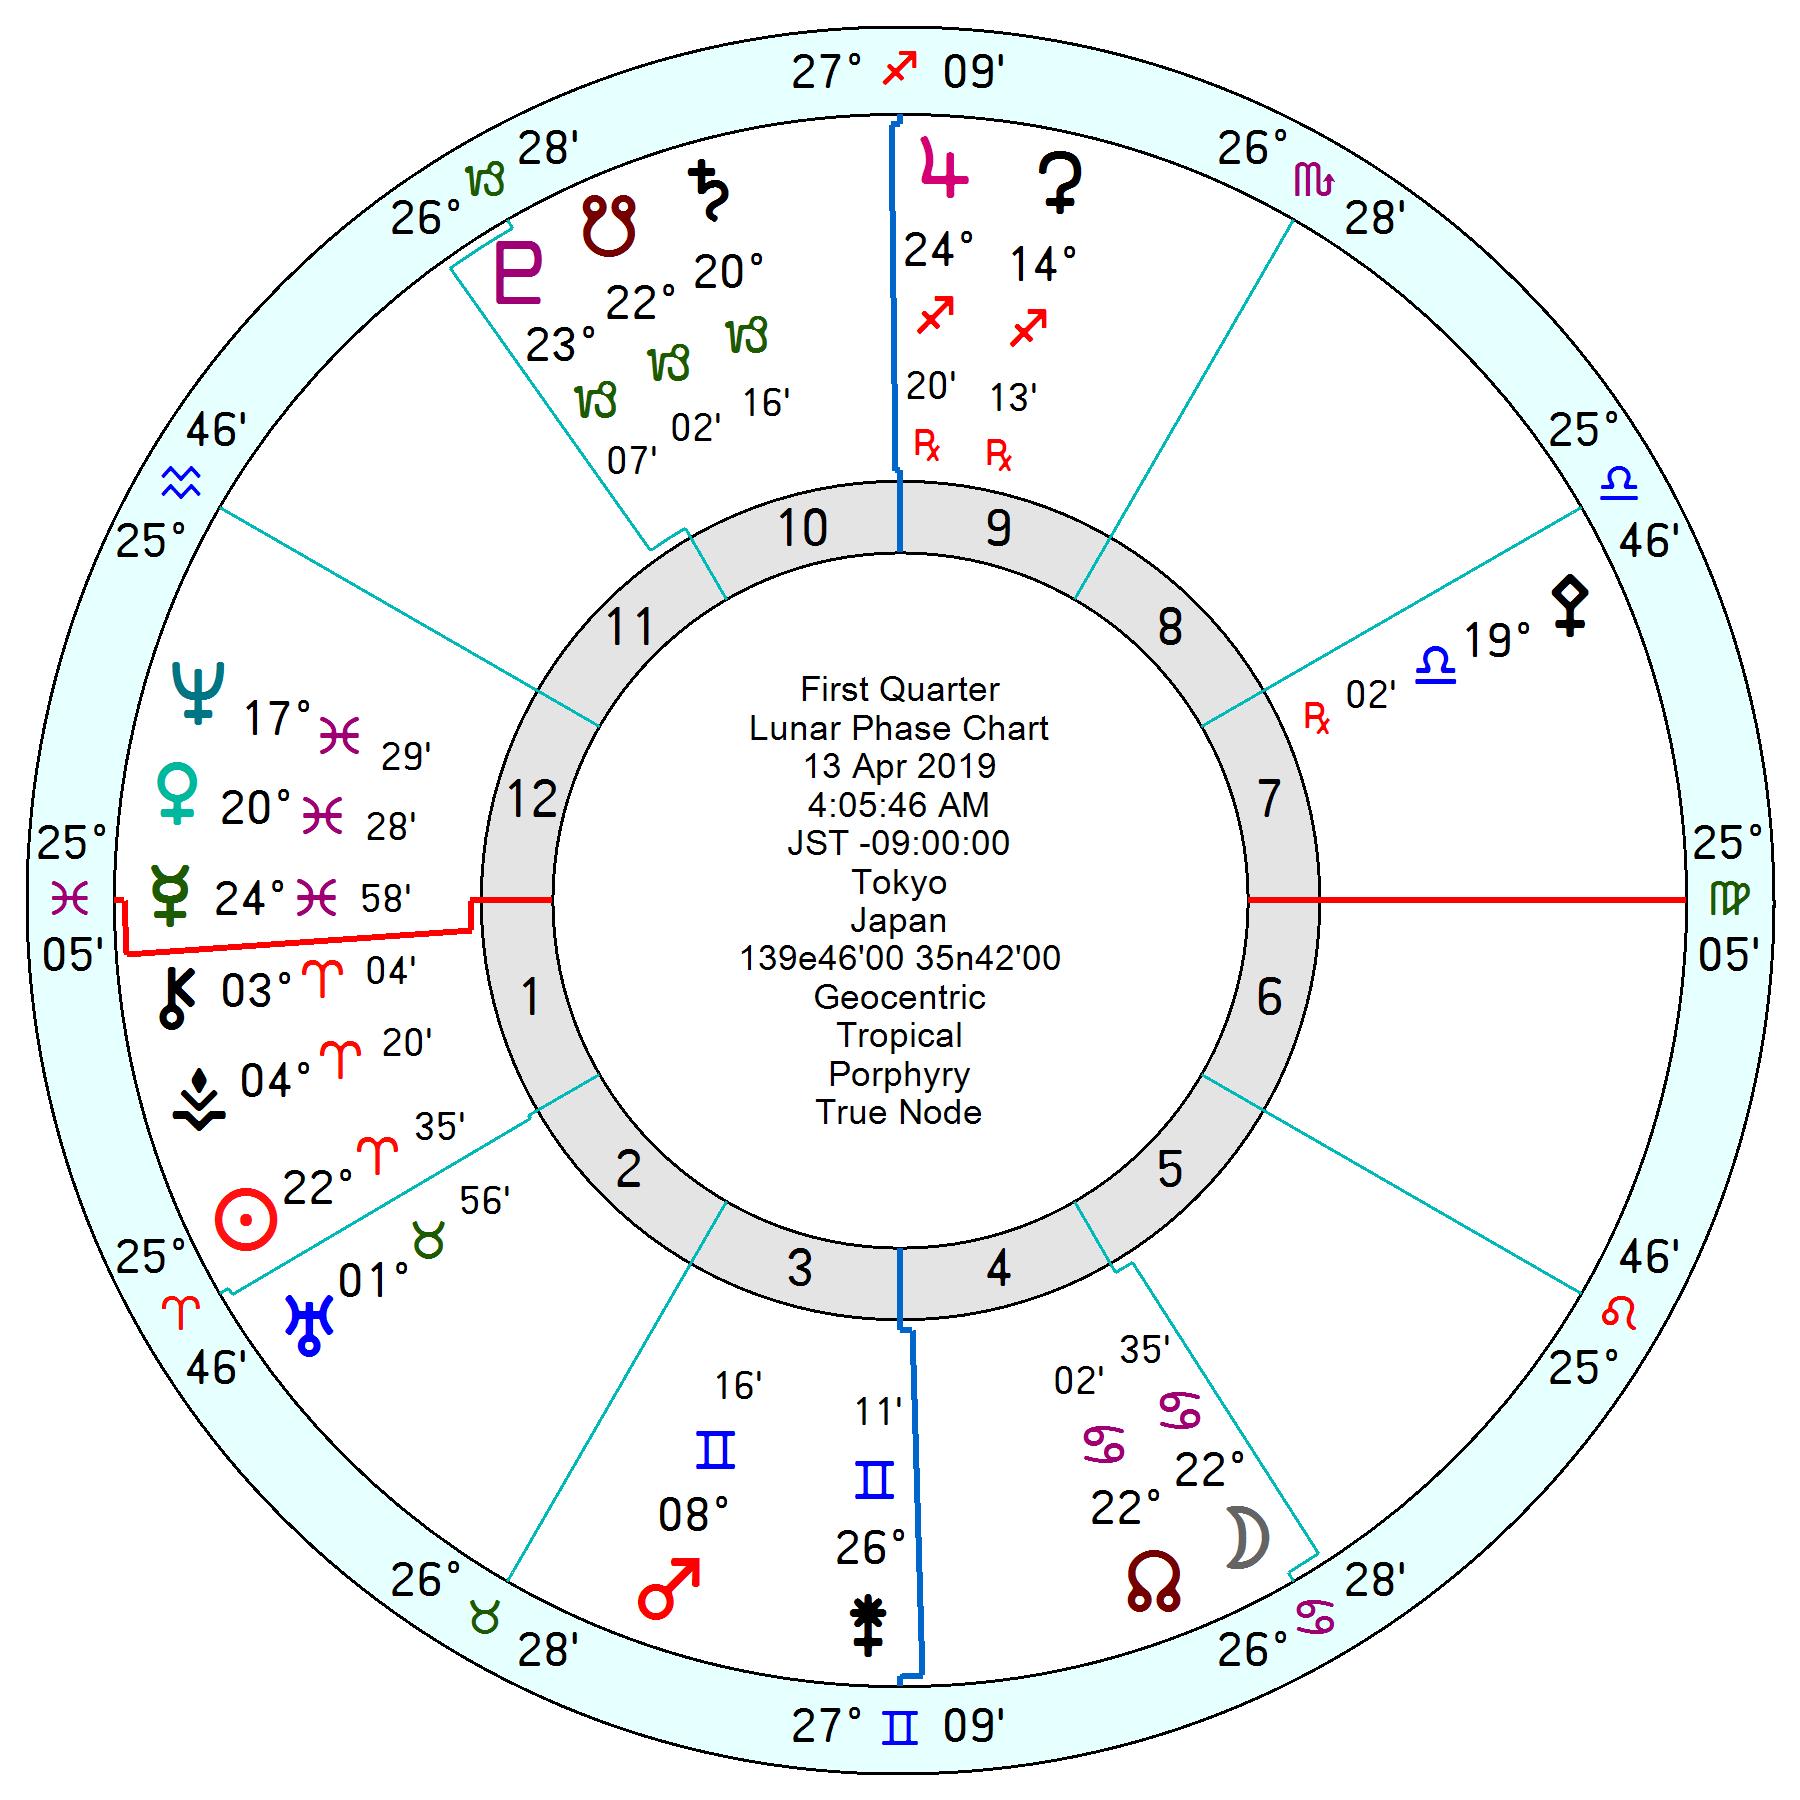 2019年4月13日蟹座上弦の月